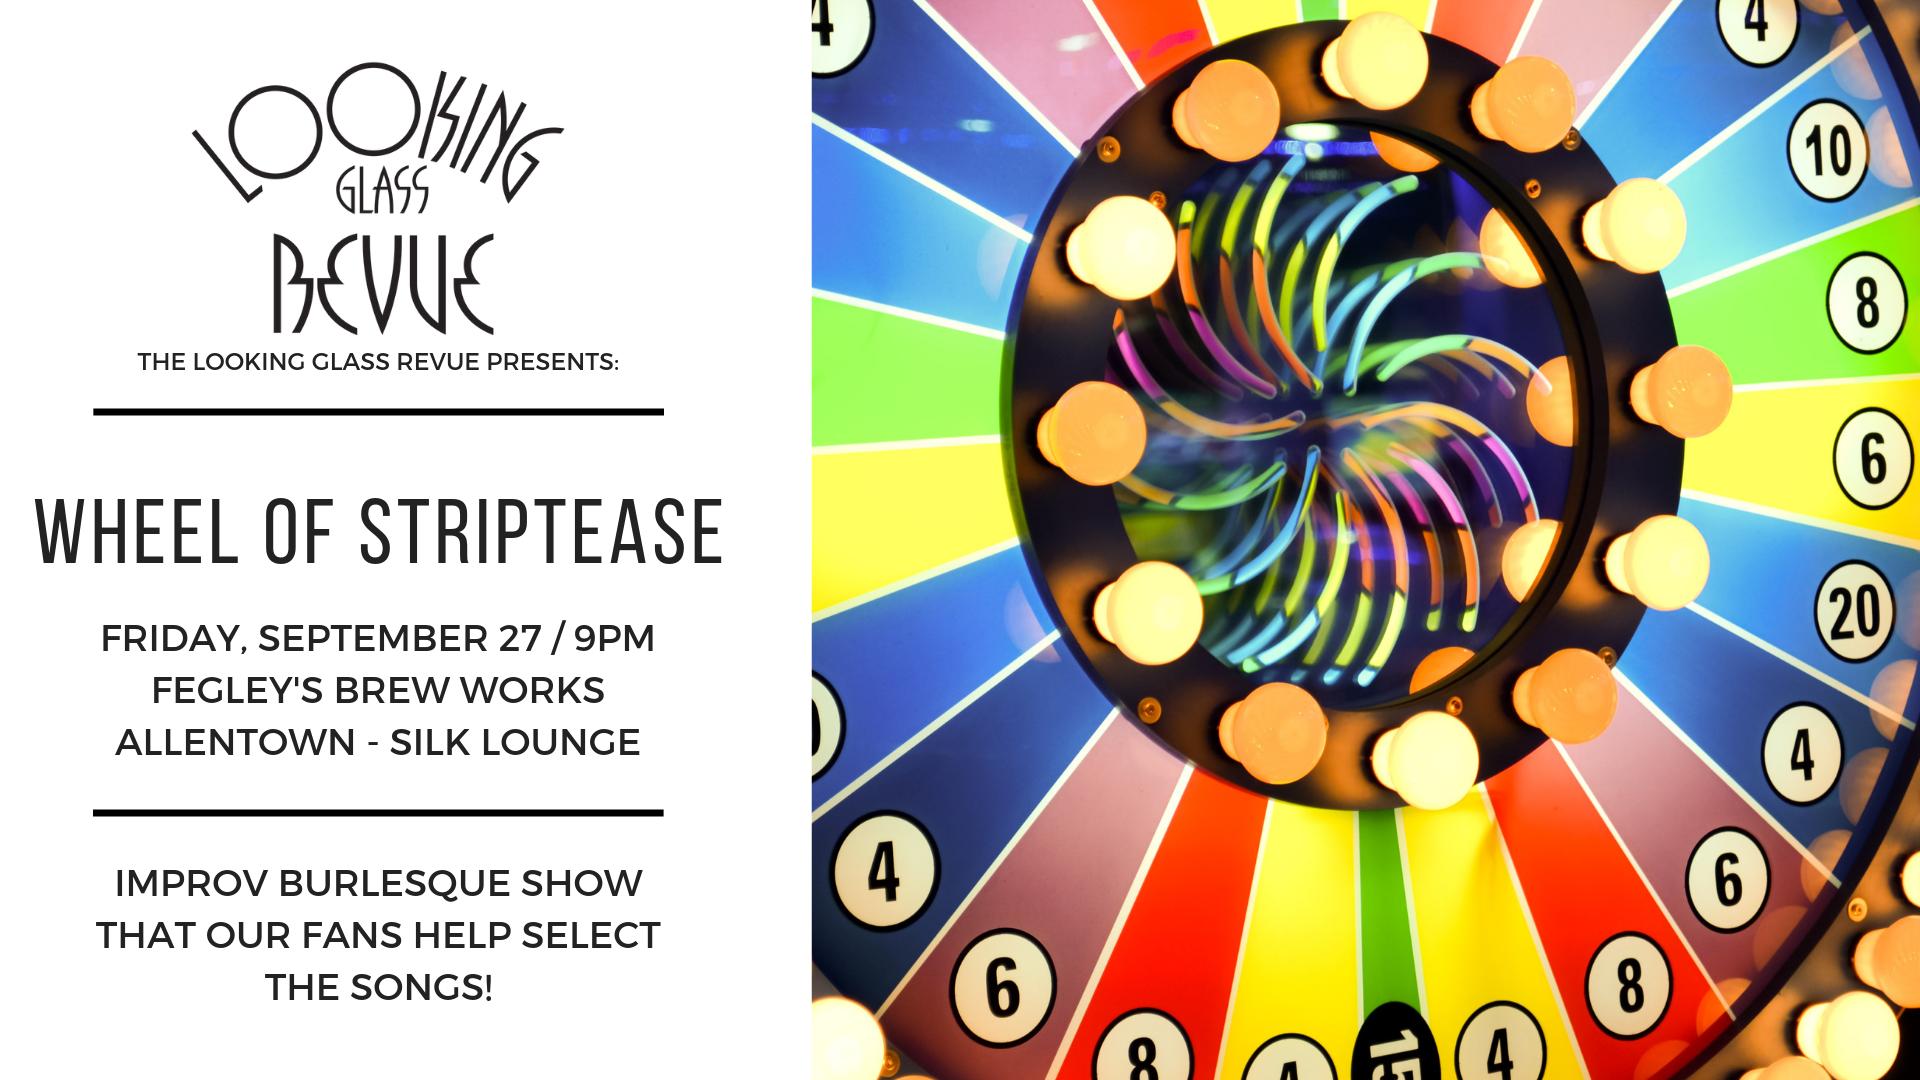 092719_Wheel of Striptease.png